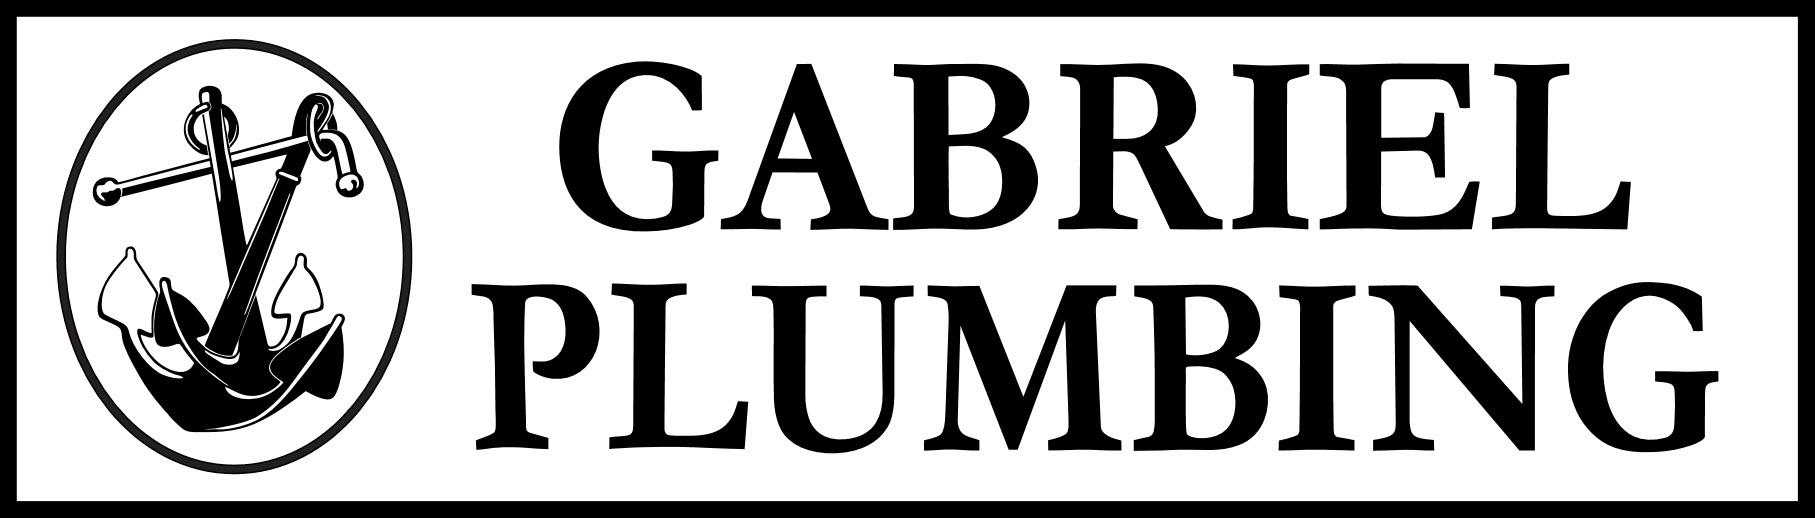 2017 BANNER GABRIEL PLUMBING.jpg